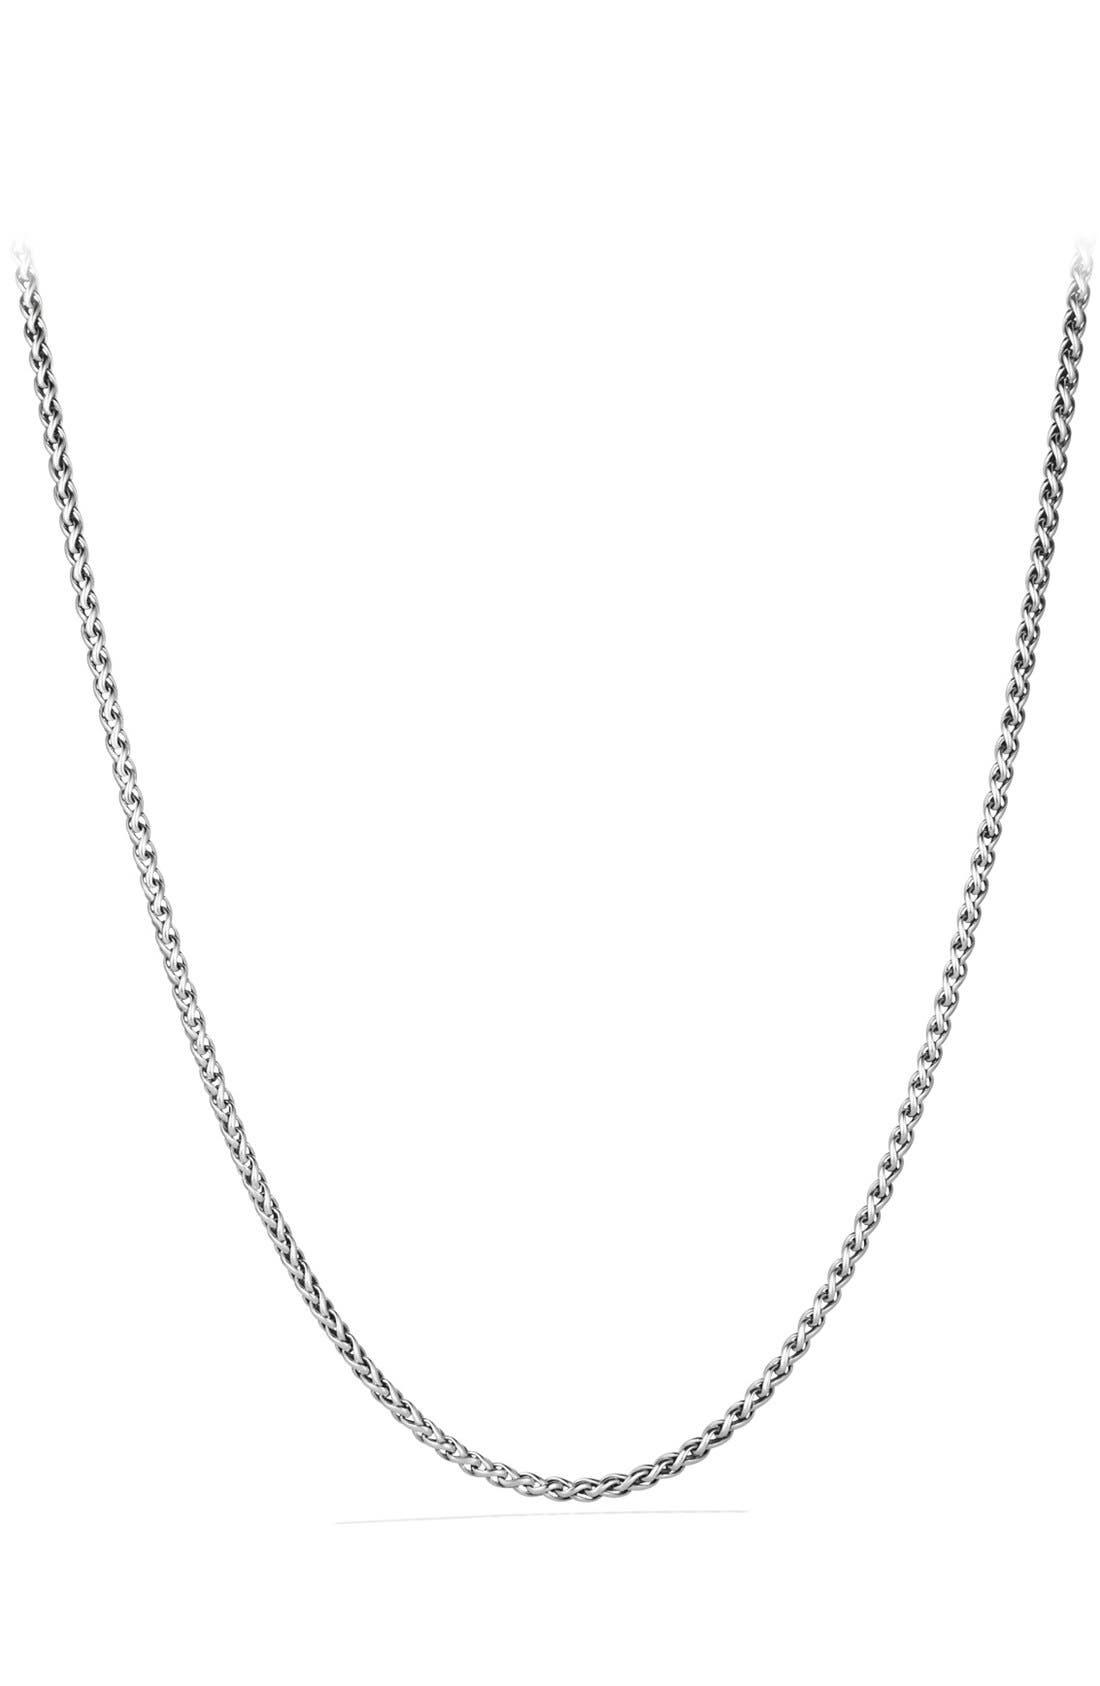 Main Image - David Yurman 'Chain' Small Wheat Chain Necklace